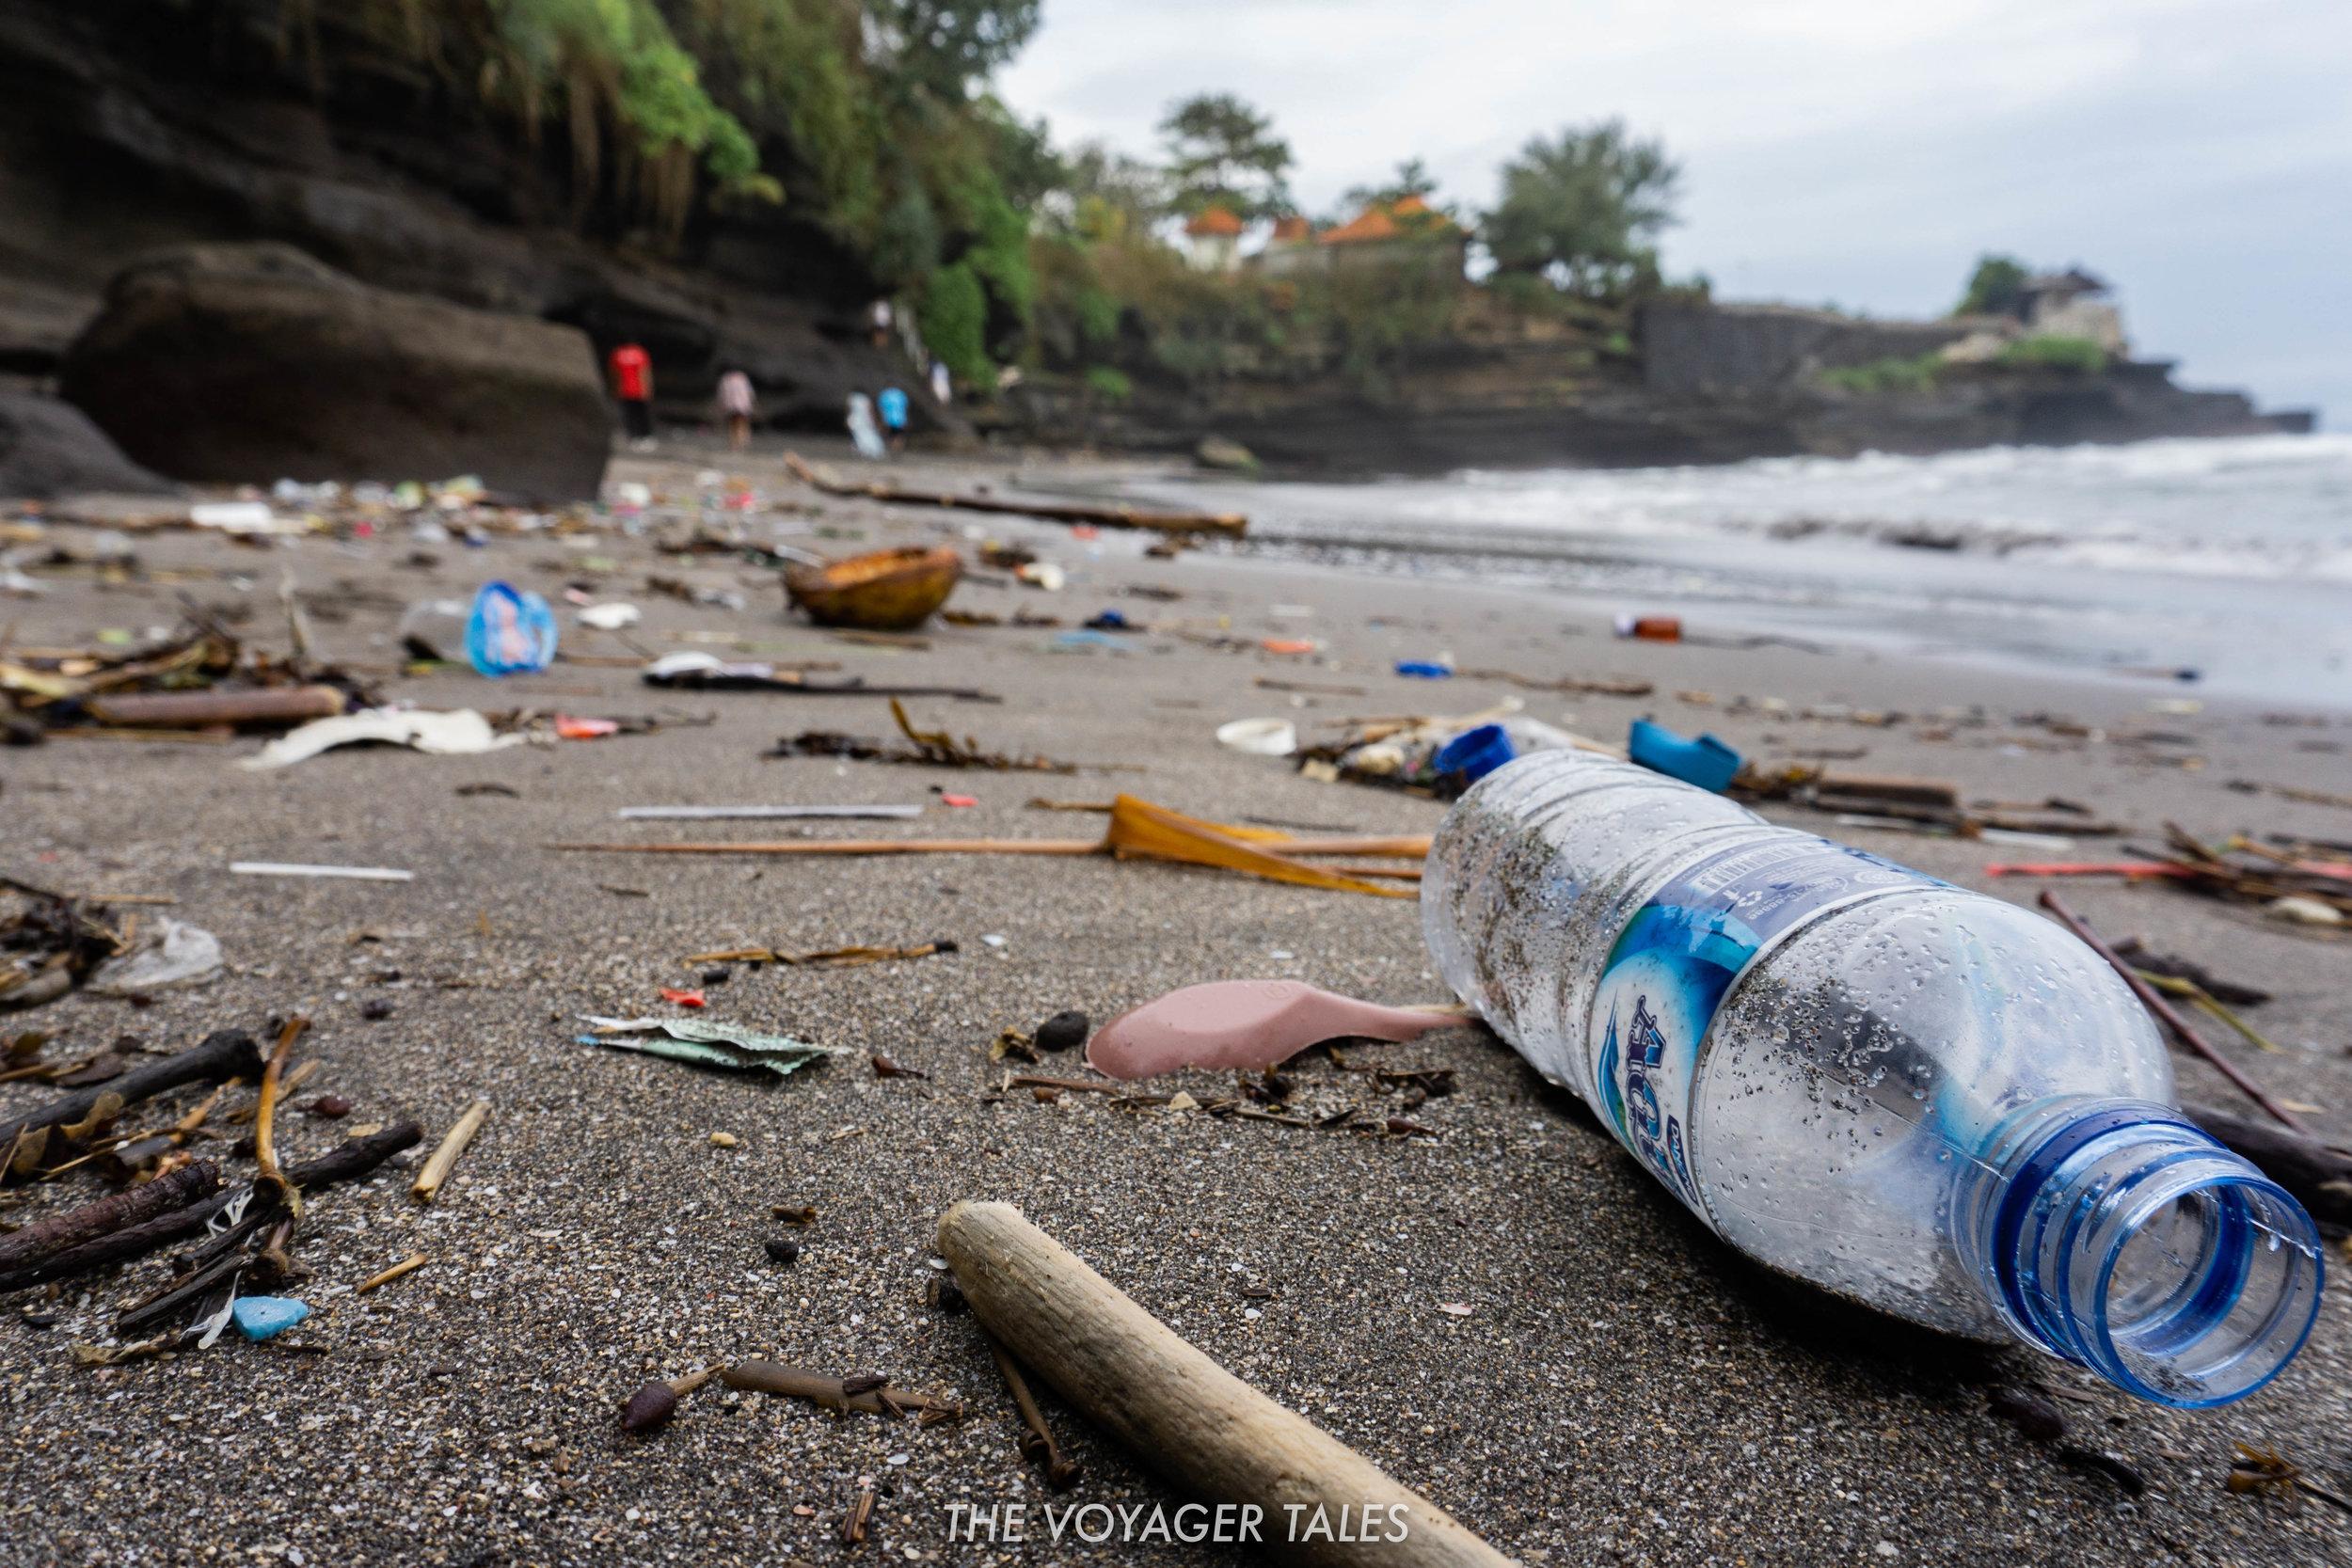 Rubbish on beach.jpg